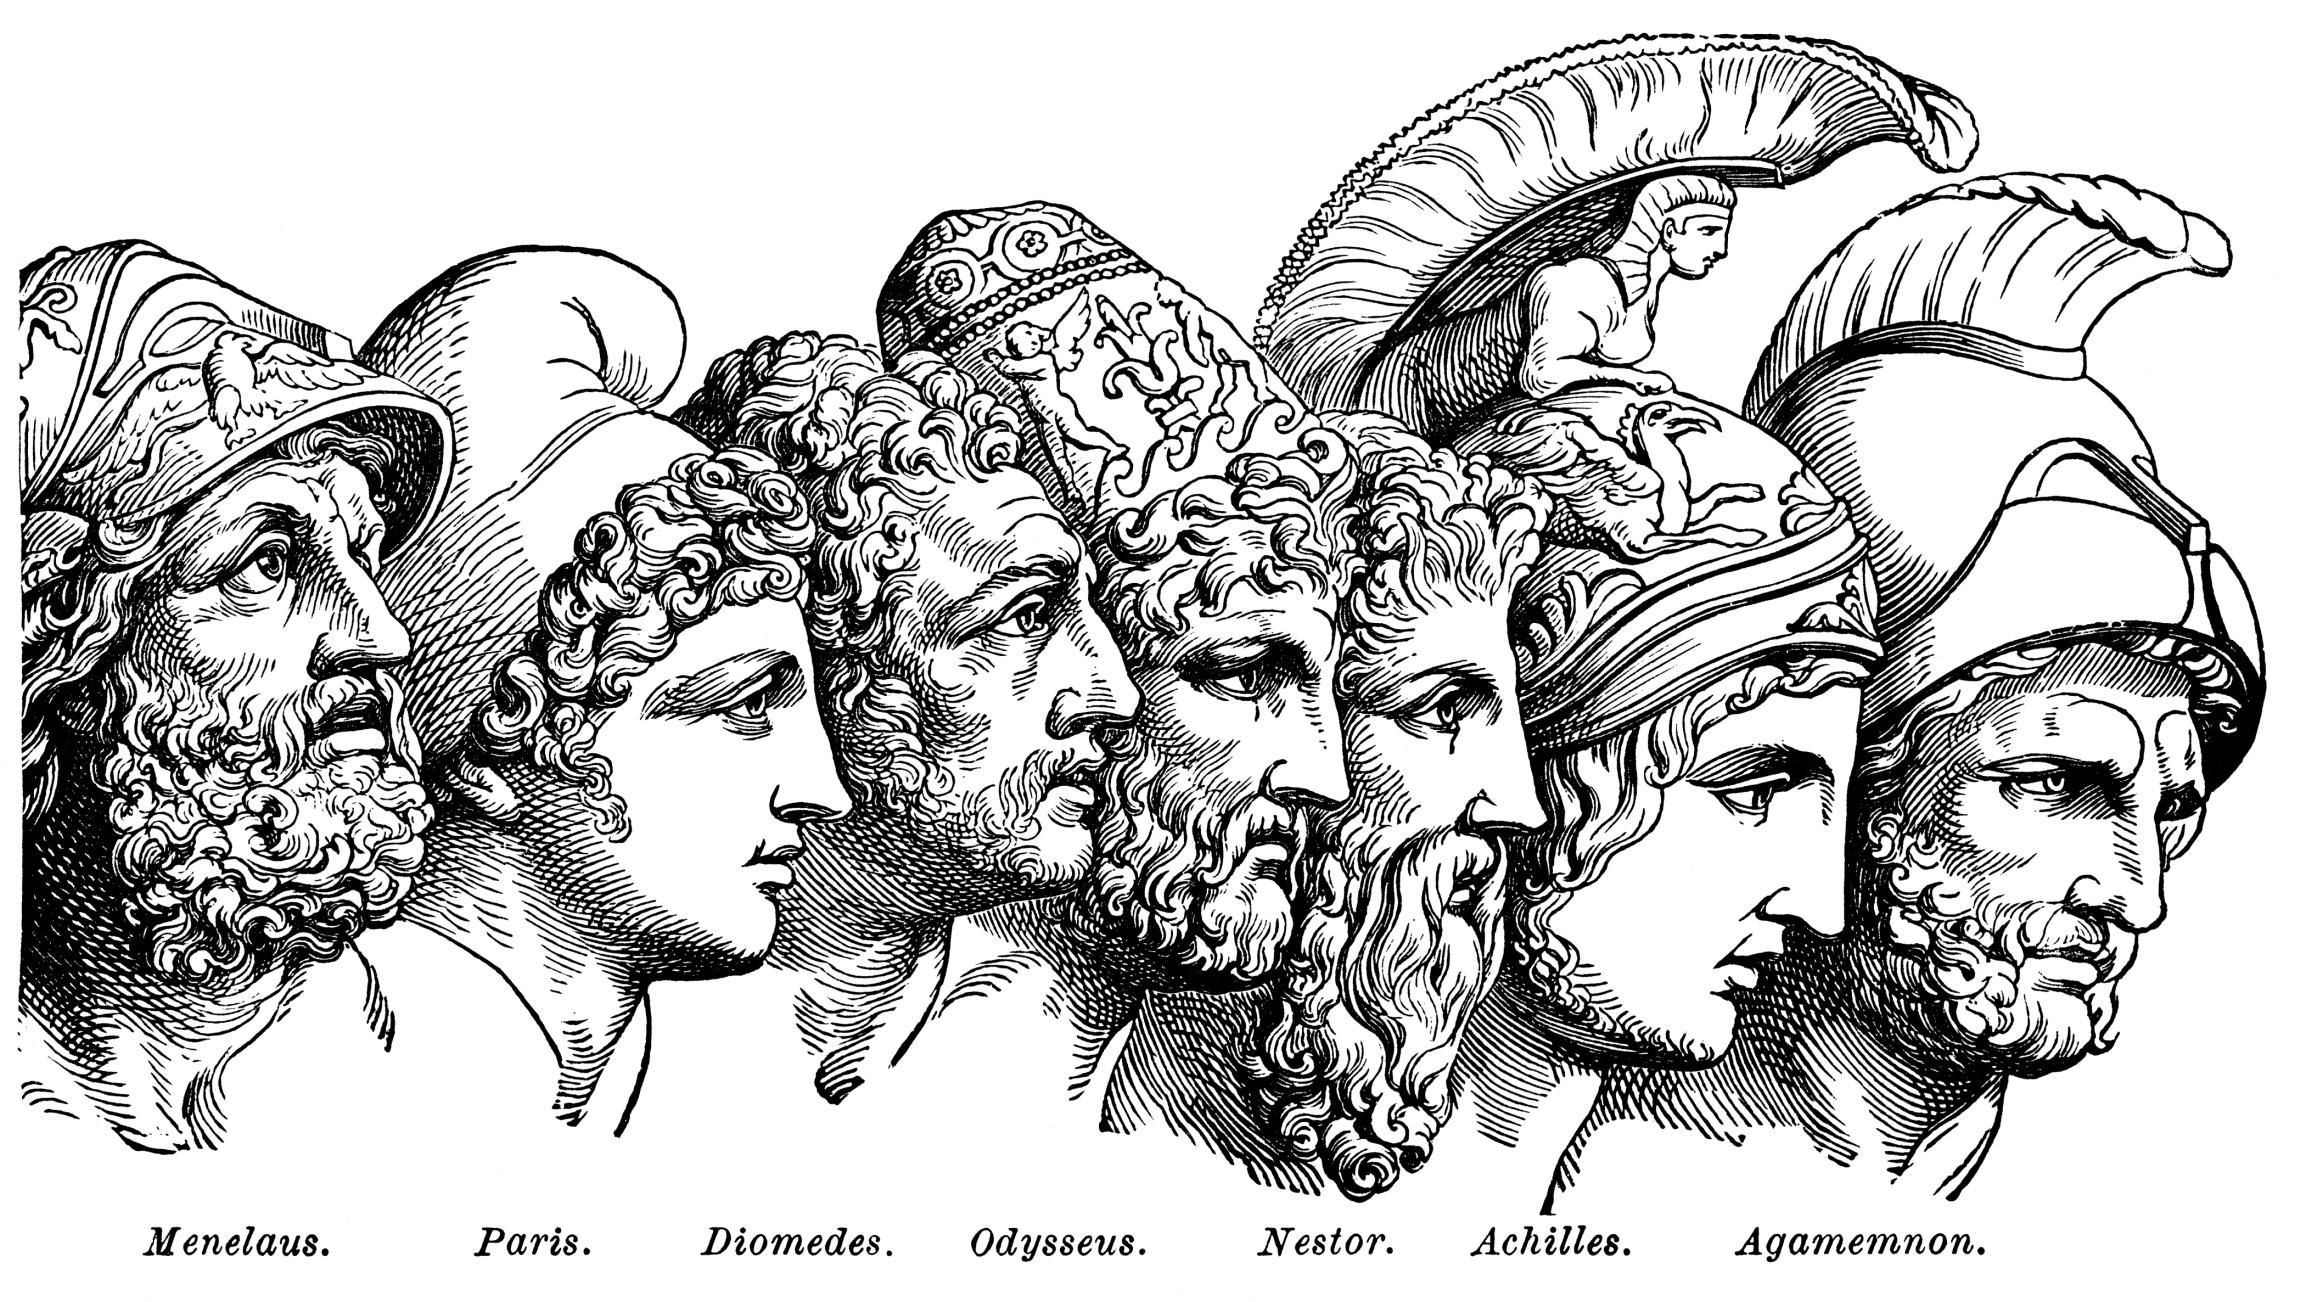 Era By Era Timeline Of Ancient Roman History